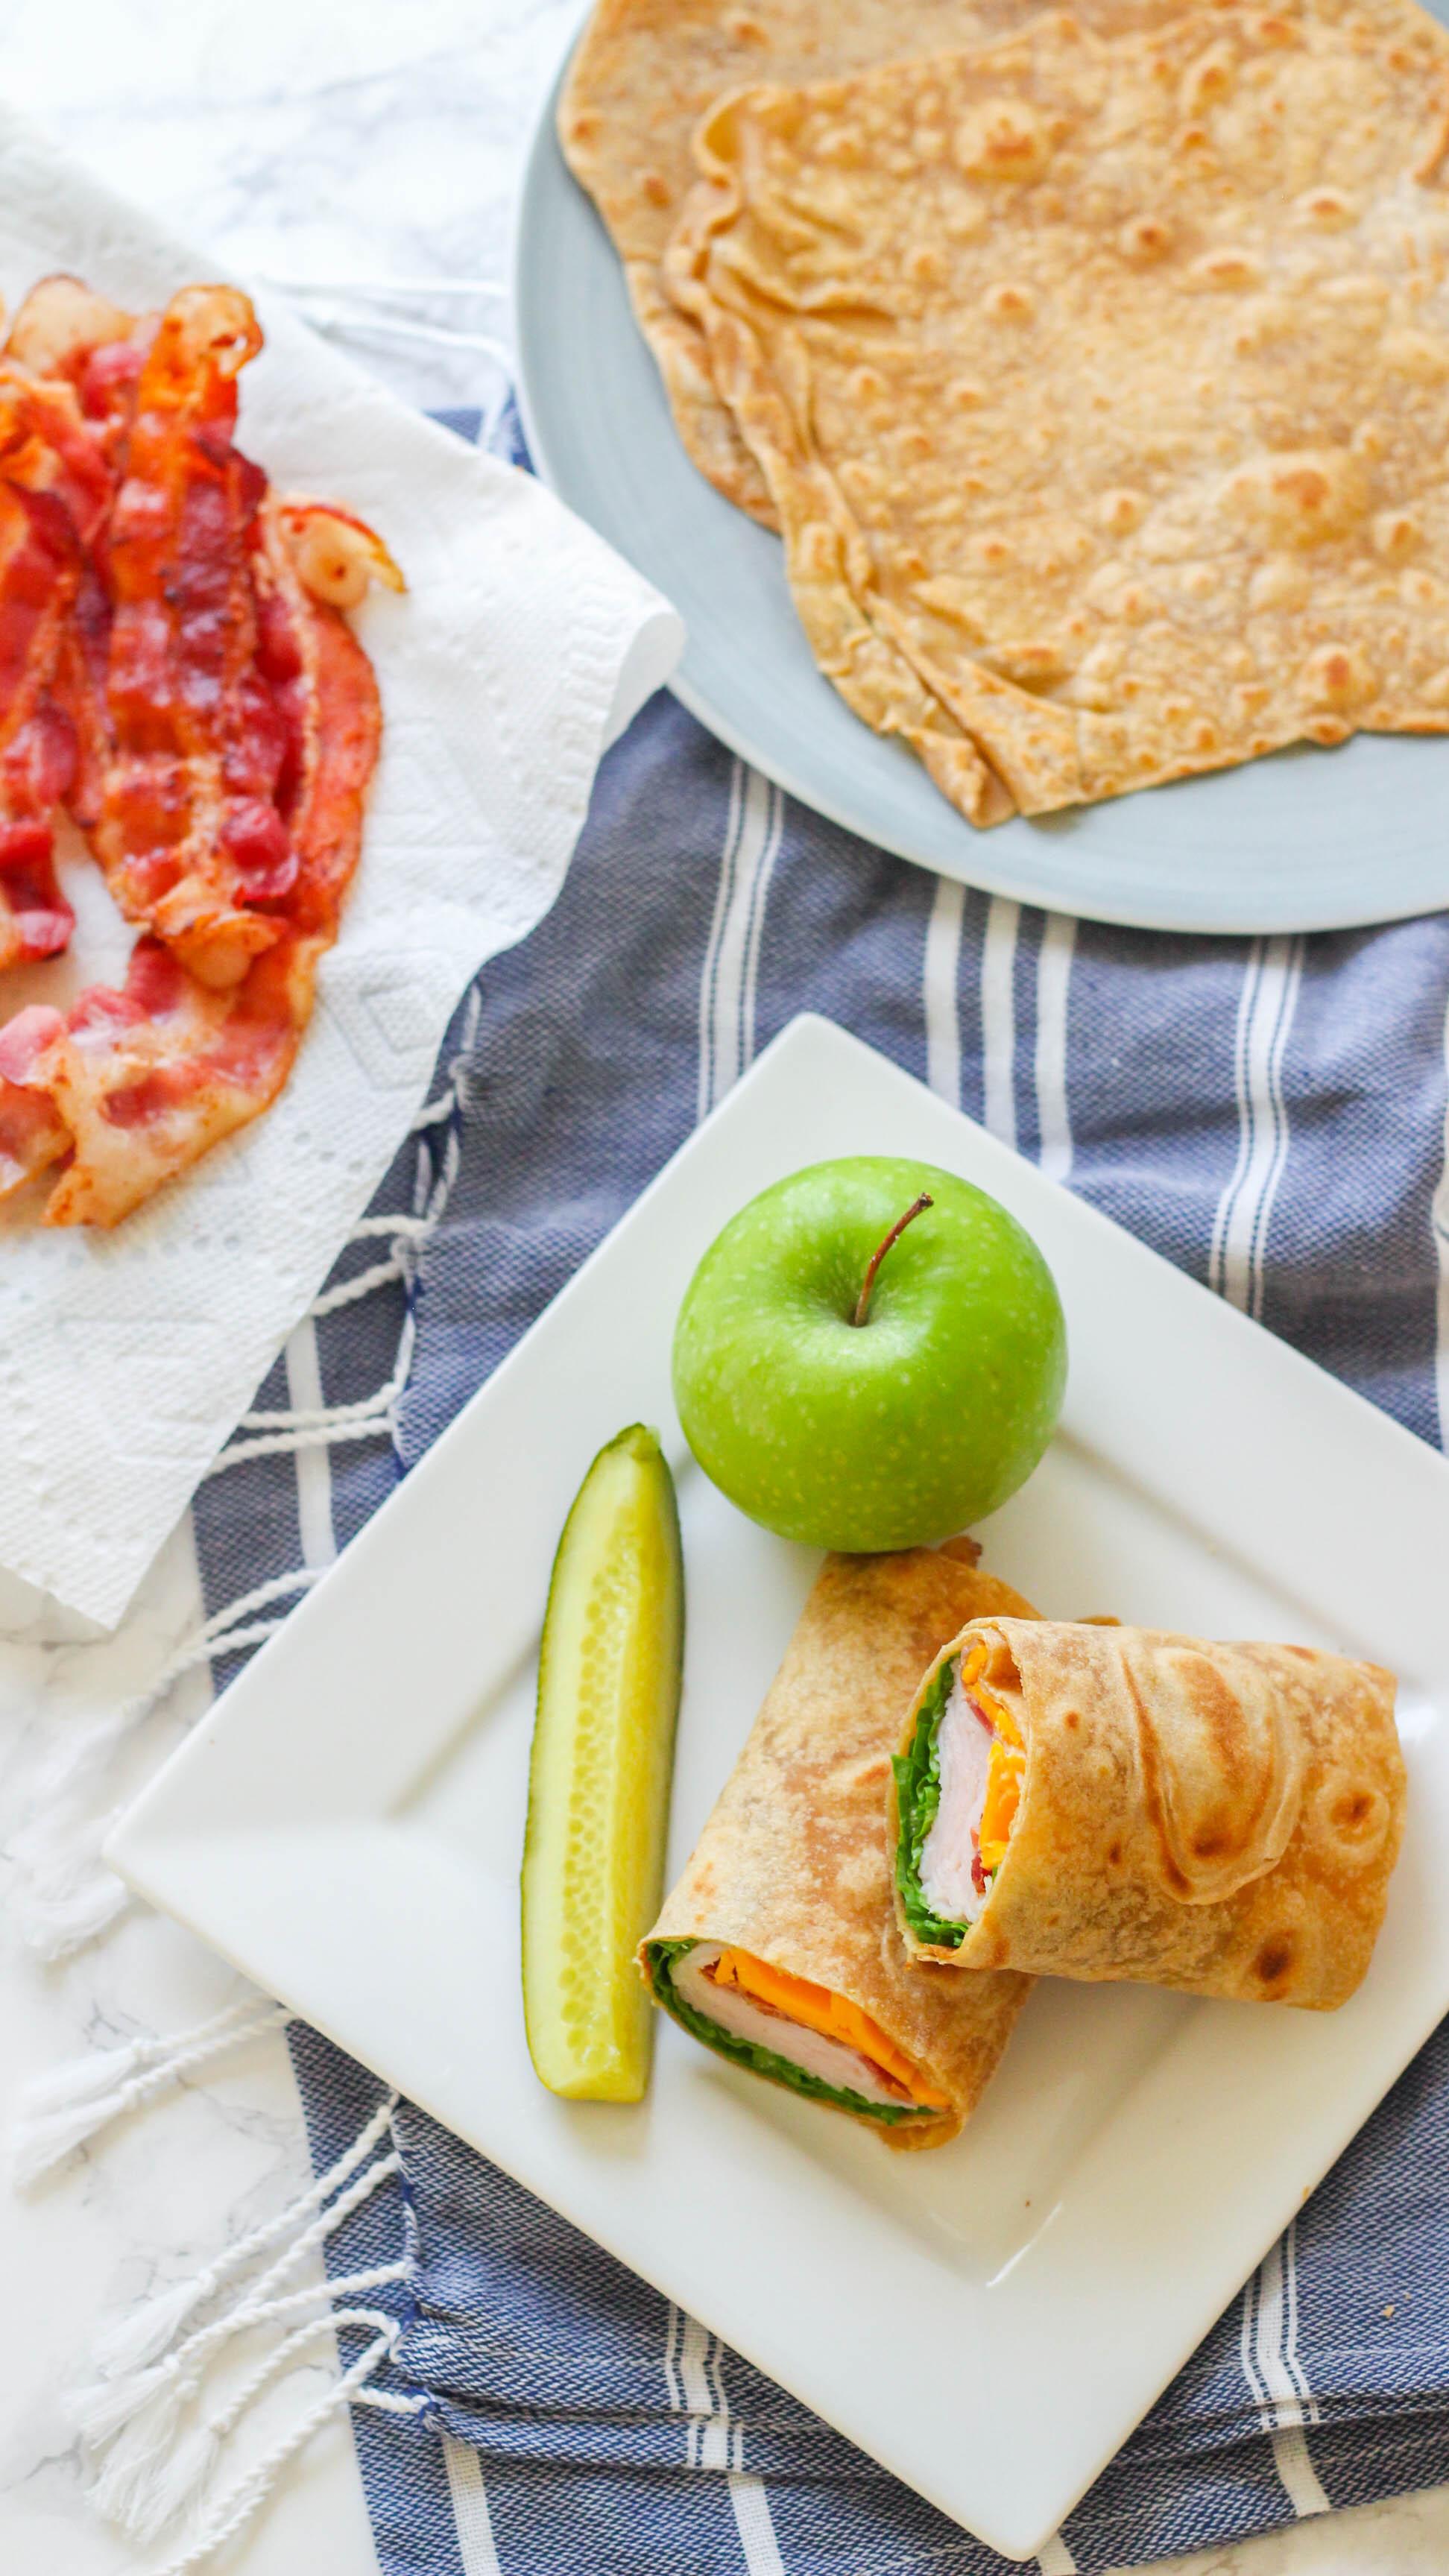 Bacon Ranch Turkey Wrap | Easy Lunch Idea | Healthy Wrap | Turkey Wrap | Bacon Wrap | Healthy wrap with bacon